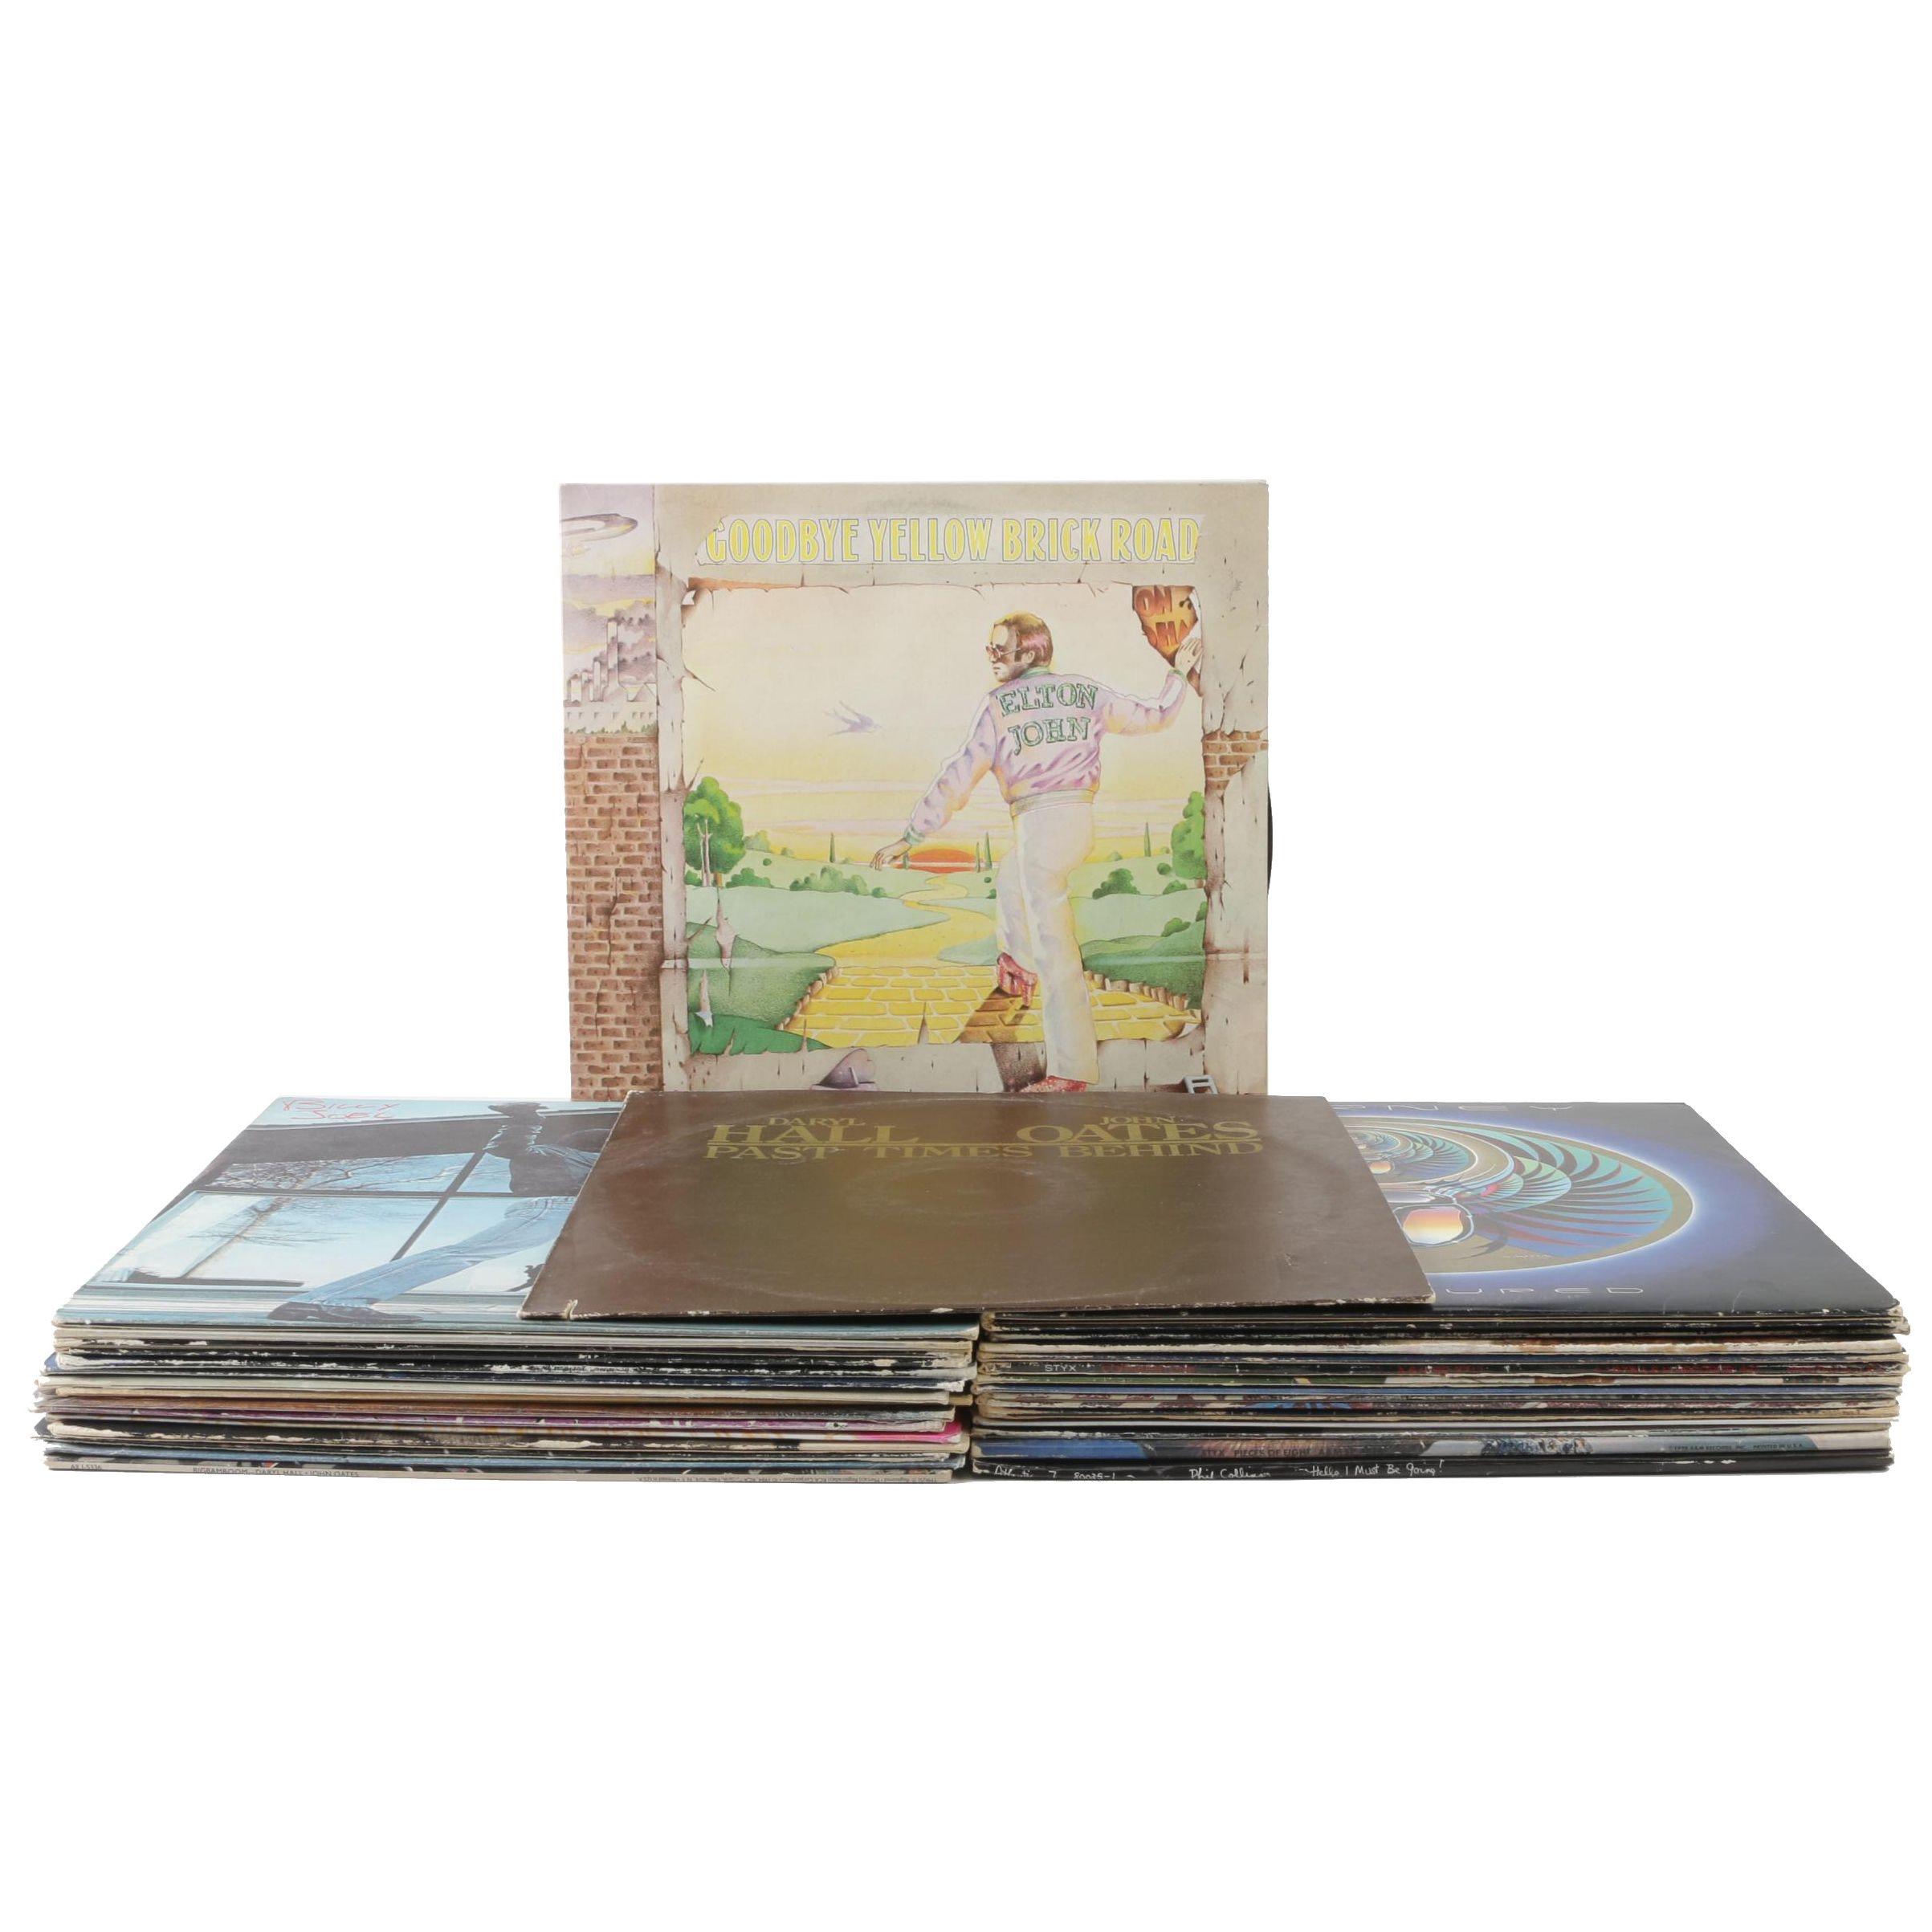 Rock and Pop Vinyl Records including Elton John, Journey, and Billy Joel